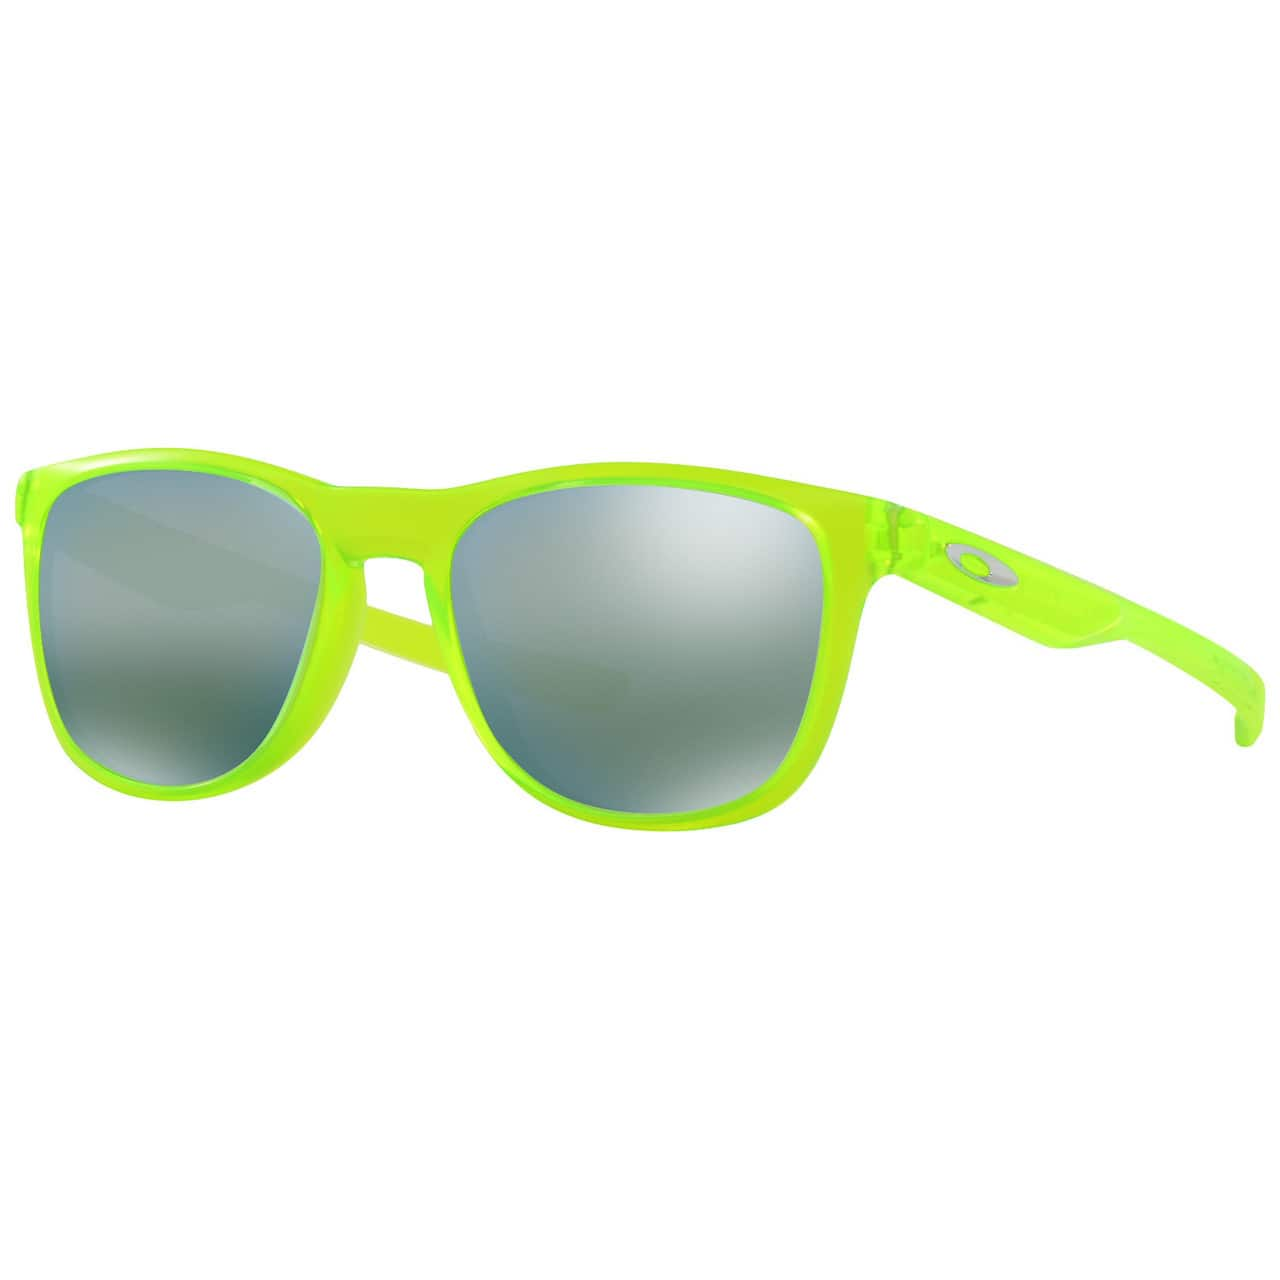 Oakley OO9340-07 Men's Trillbe X Emerald Iridium Lens Matte Uranium Frame Sunglasses for $39.99 (70% off)